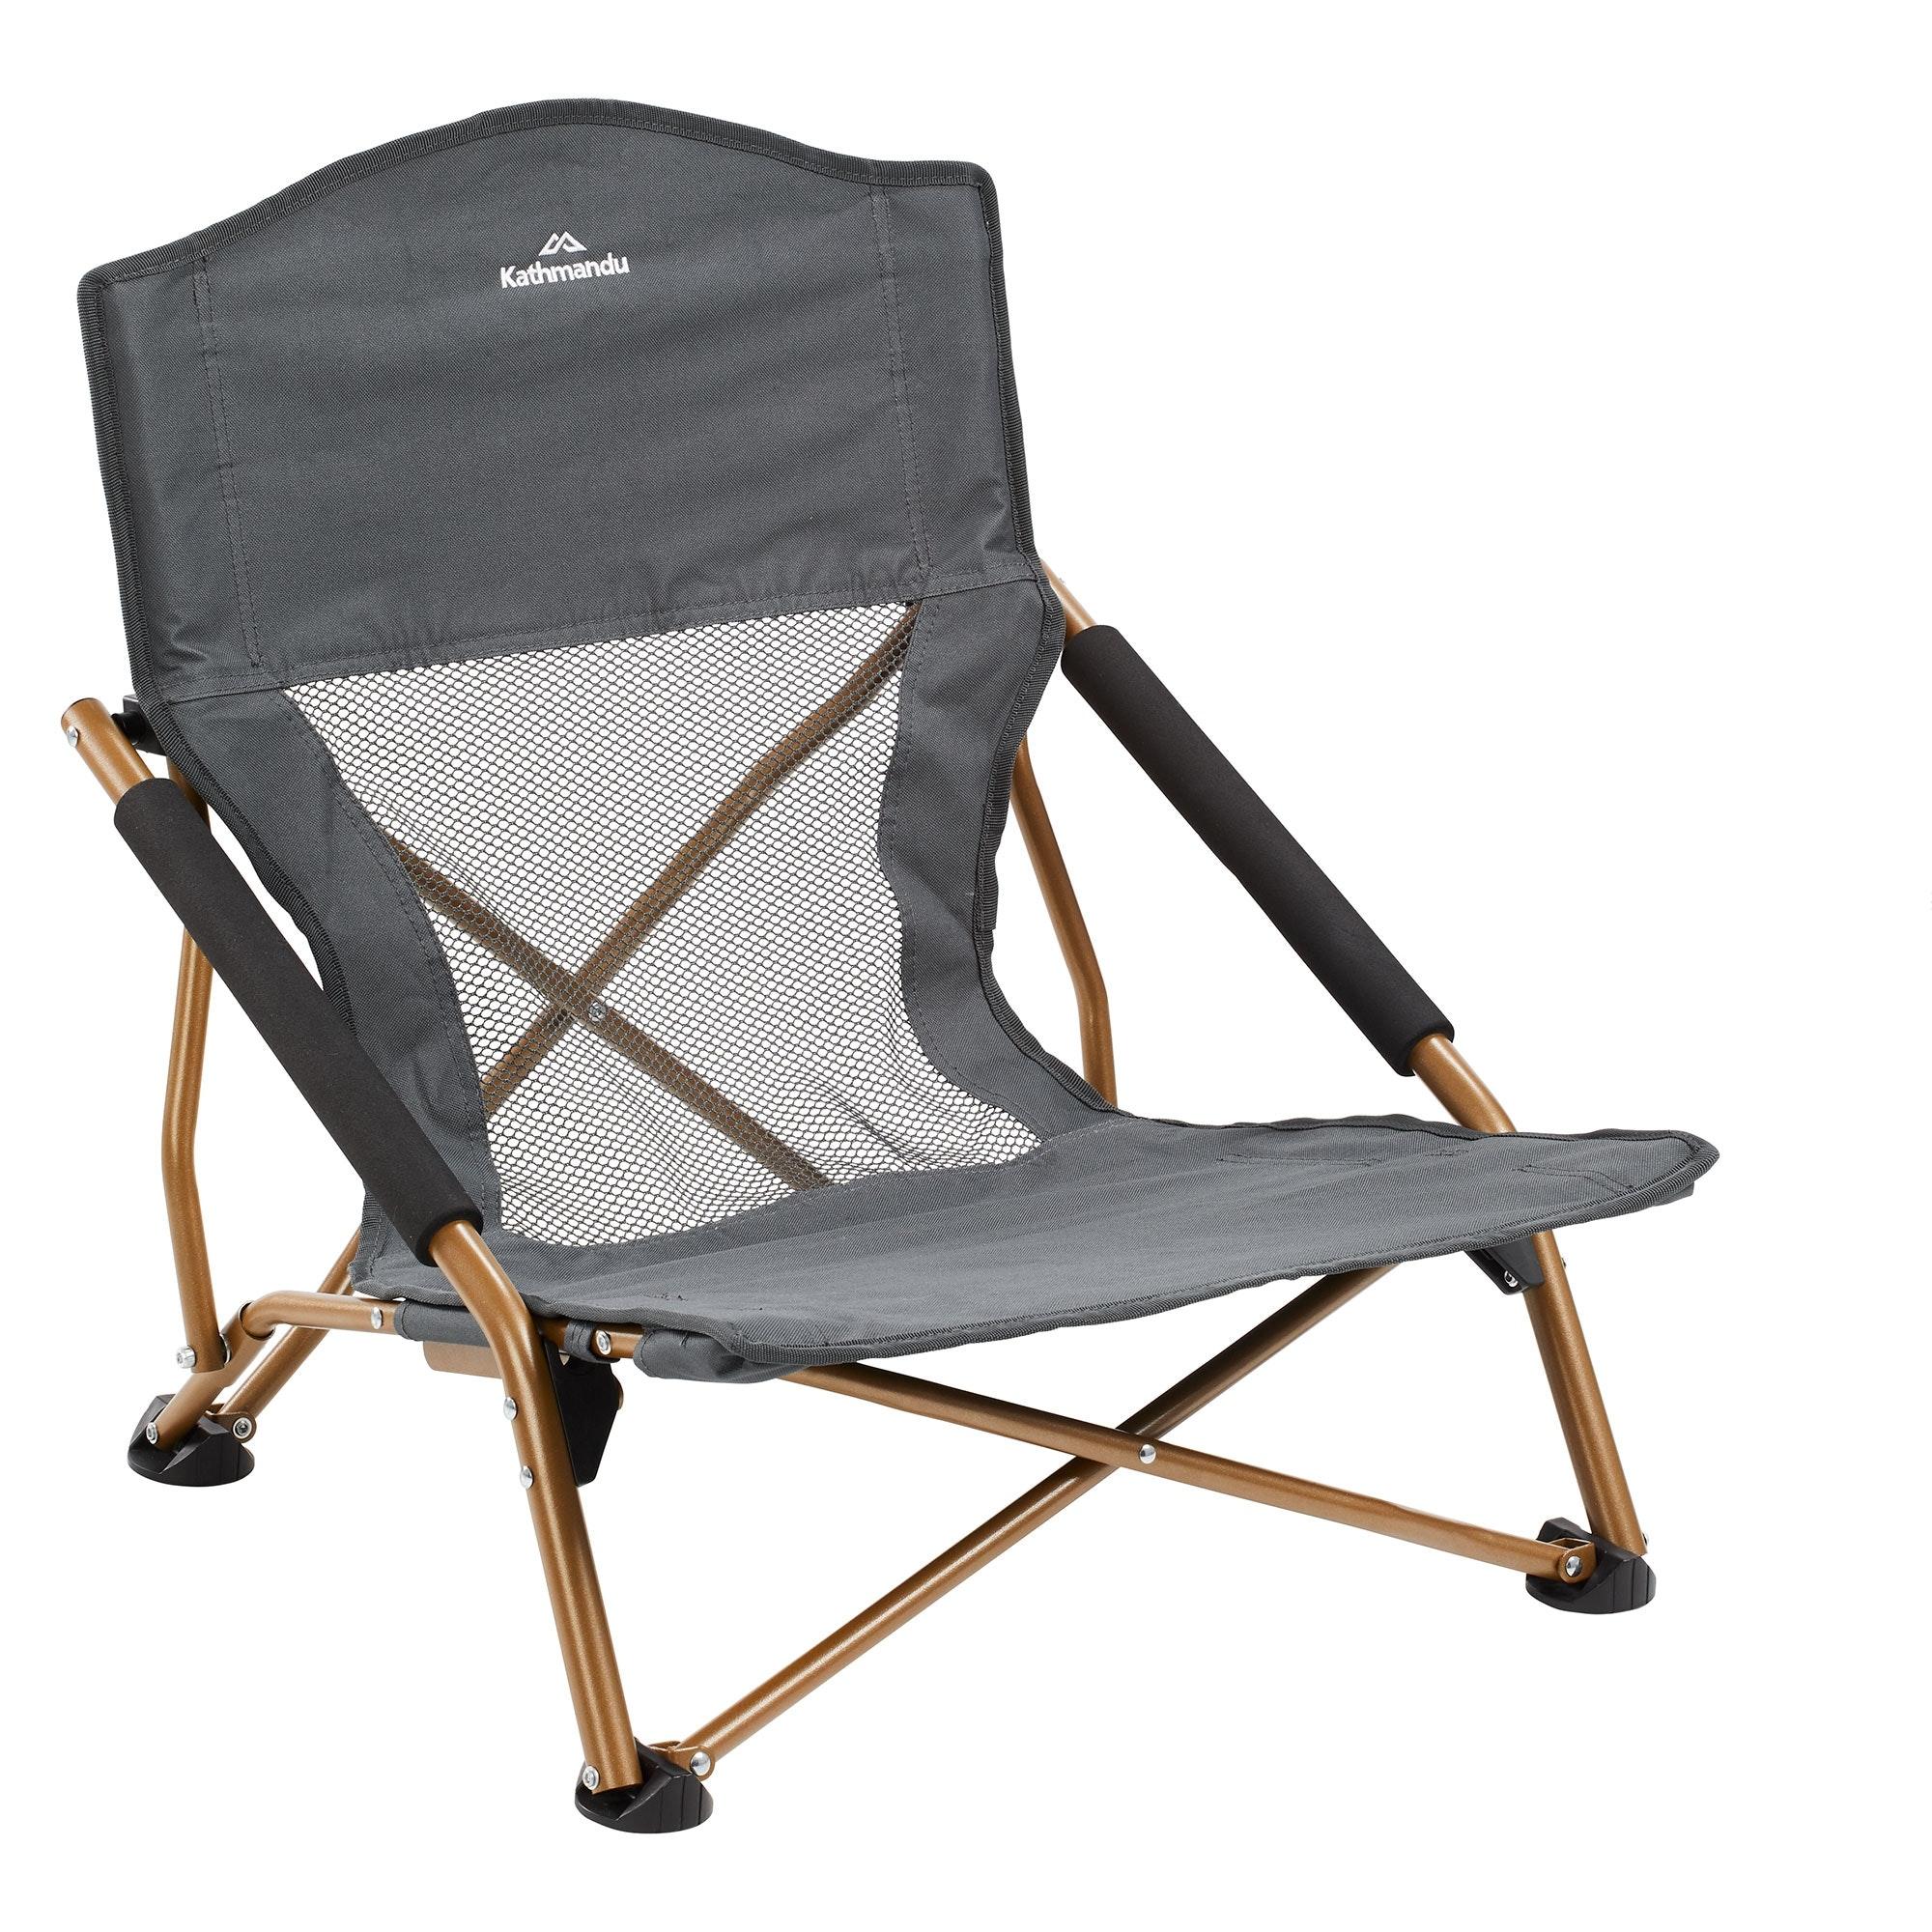 Remarkable Outdoor Folding Chair Moon Chair Sun Chair Recliner Round Machost Co Dining Chair Design Ideas Machostcouk